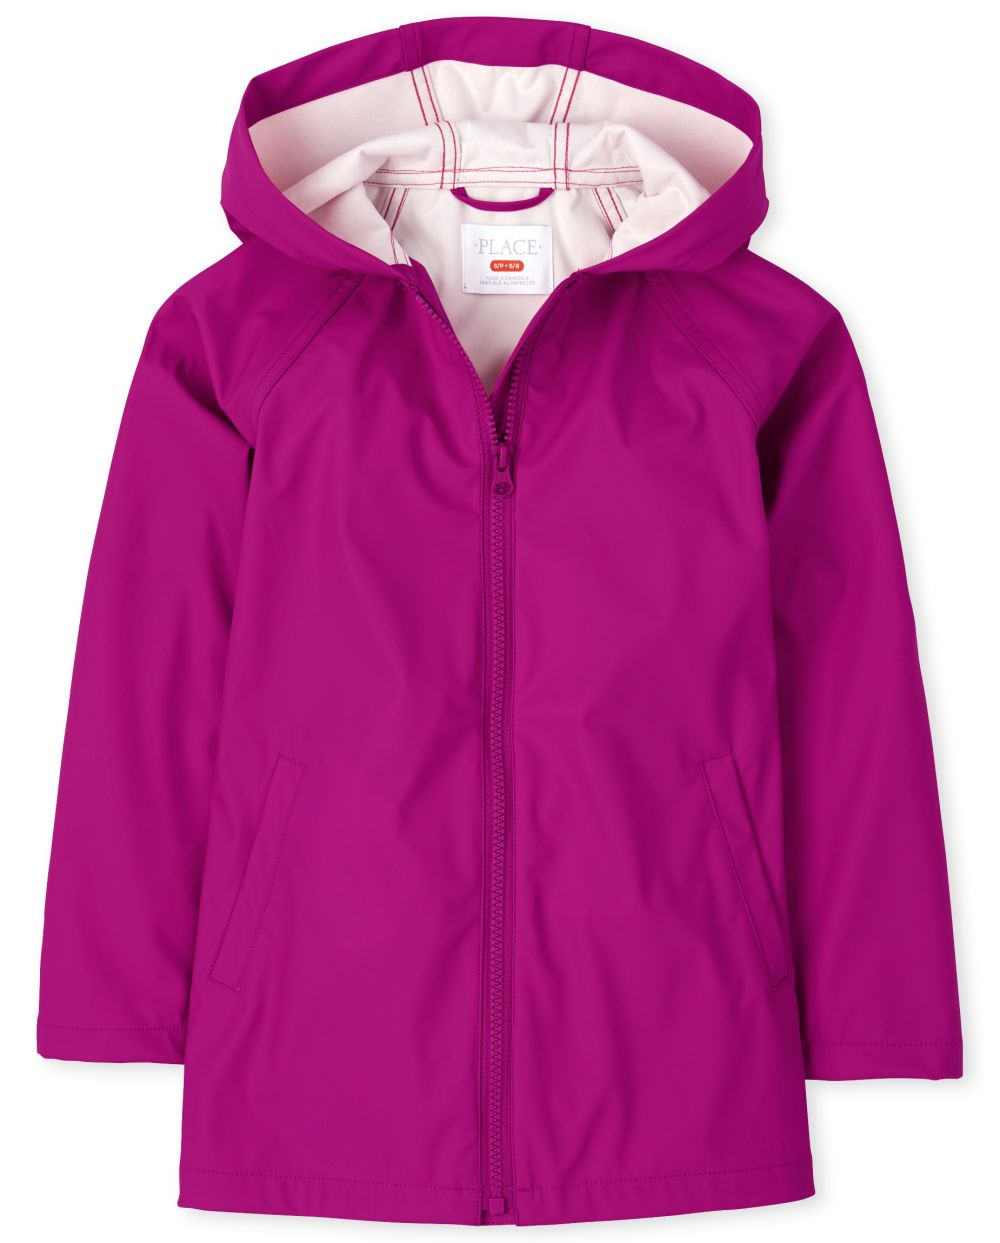 Girls Raincoat